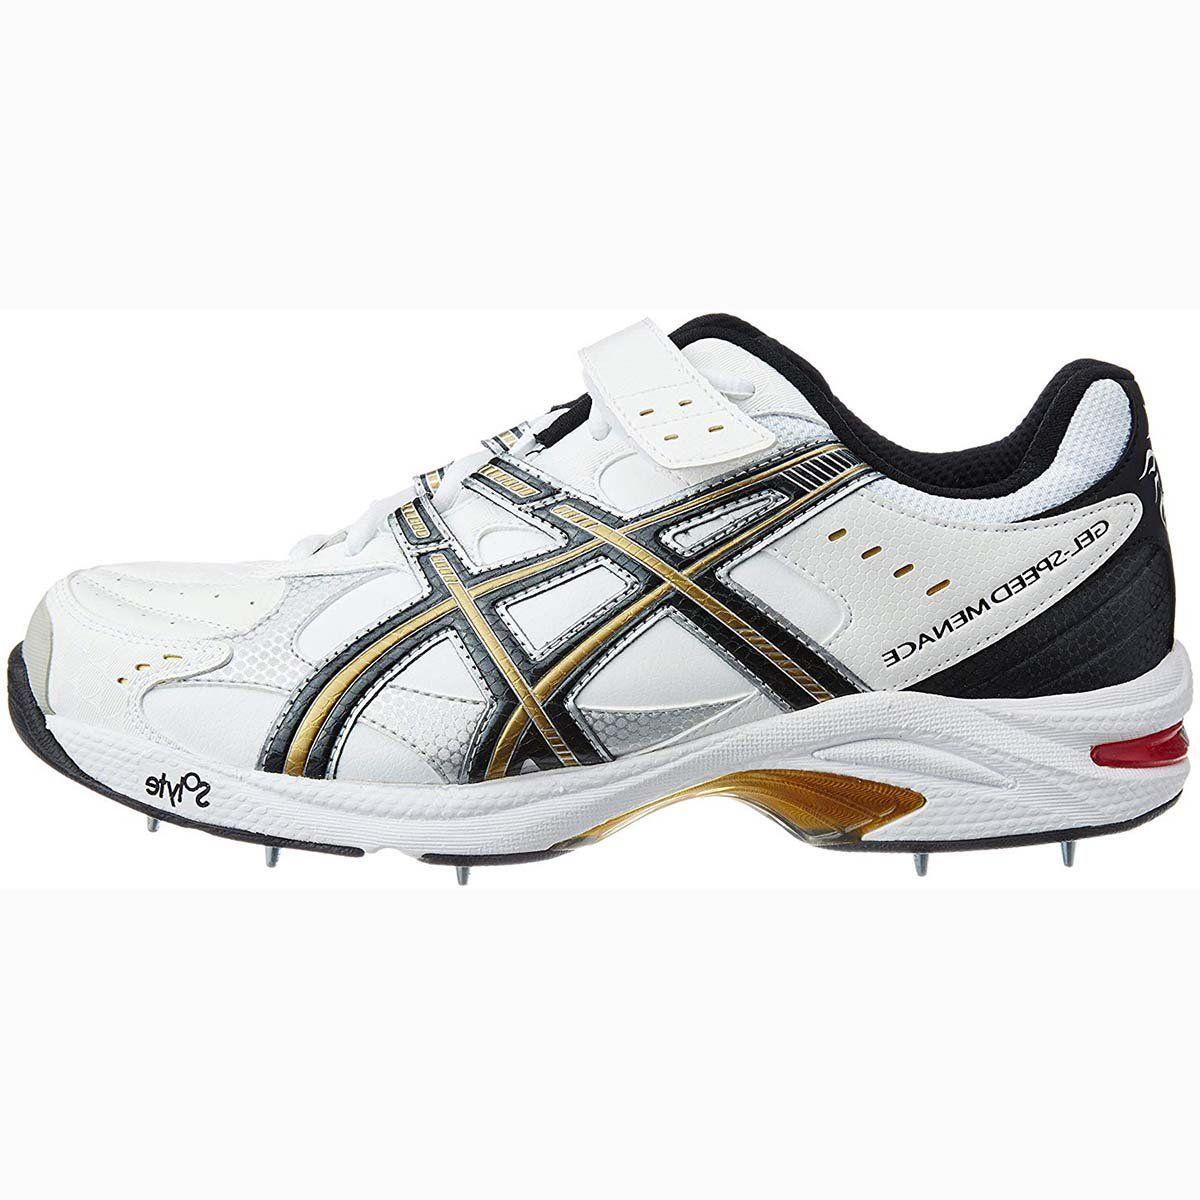 Asics Gel Speed Menance Cricket Shoes Wht Blk Gld In 2020 Asics Asics Gel Shoes